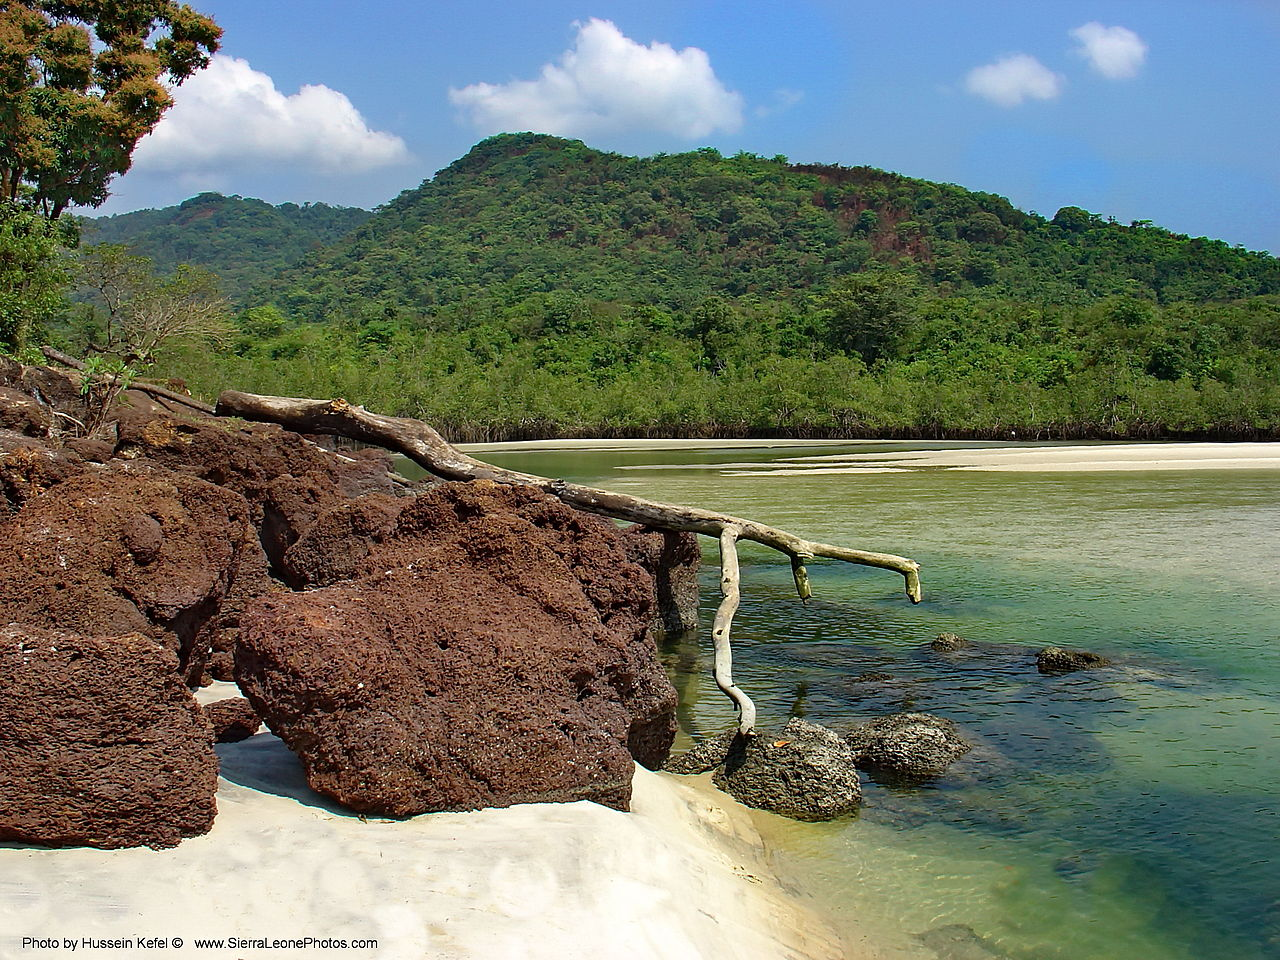 Capital City Oil >> File:The Number 2 , Sierra Leone.jpg - Wikimedia Commons